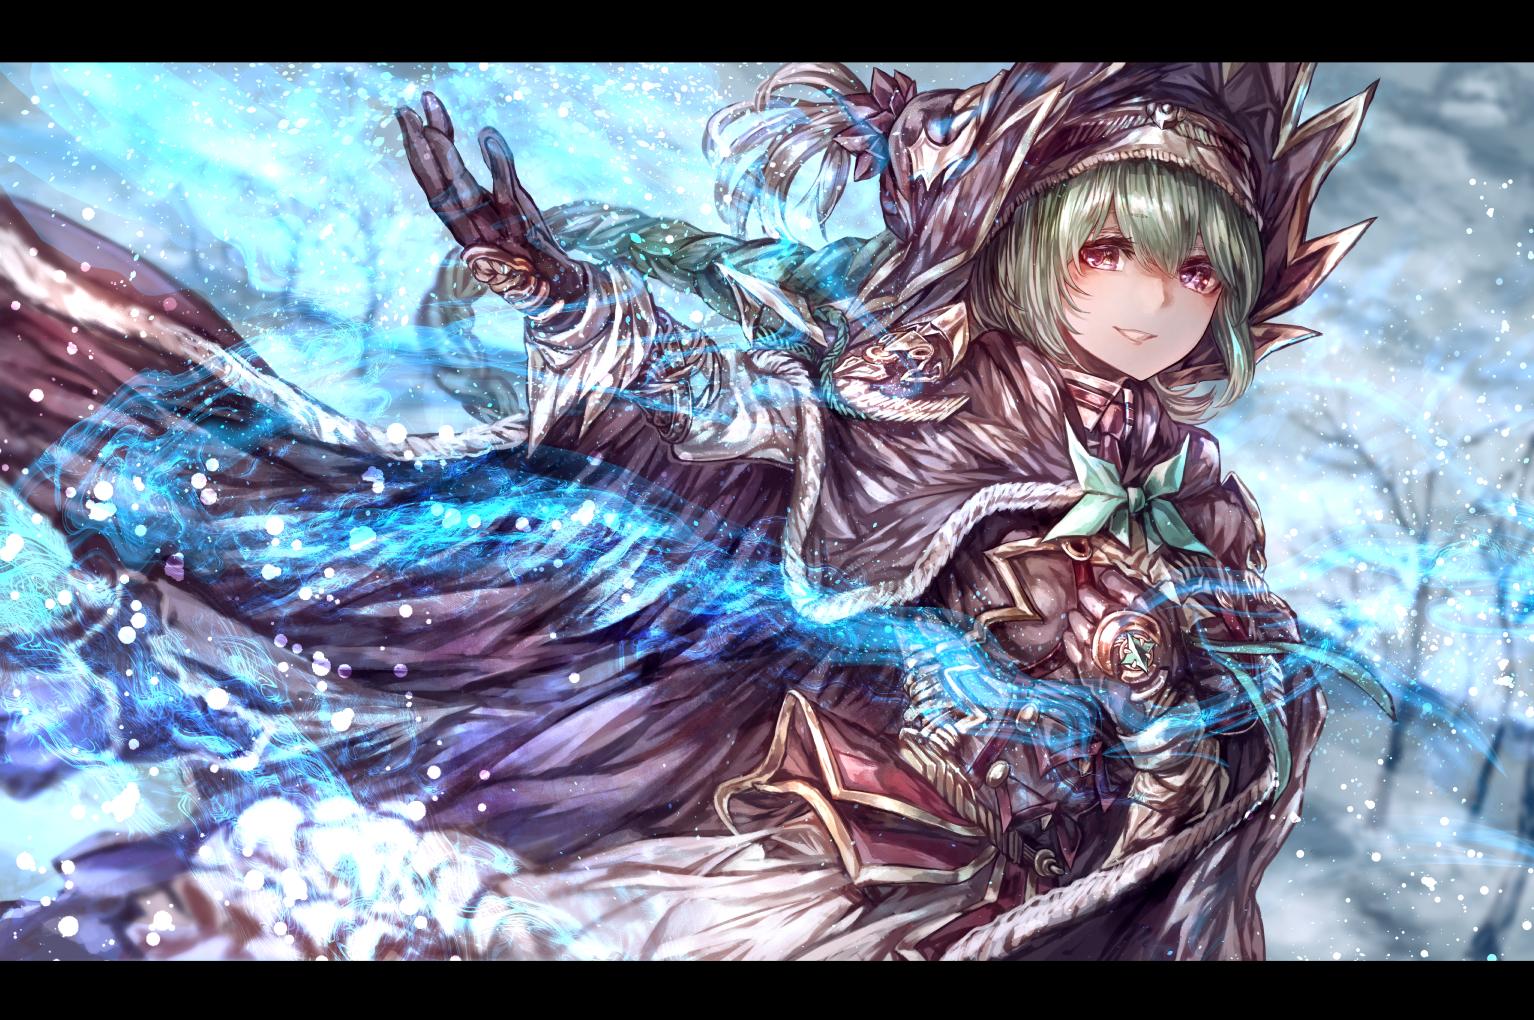 Anime 1534x1020 signo aaa green hair anime anime girls snow braided hair Armored